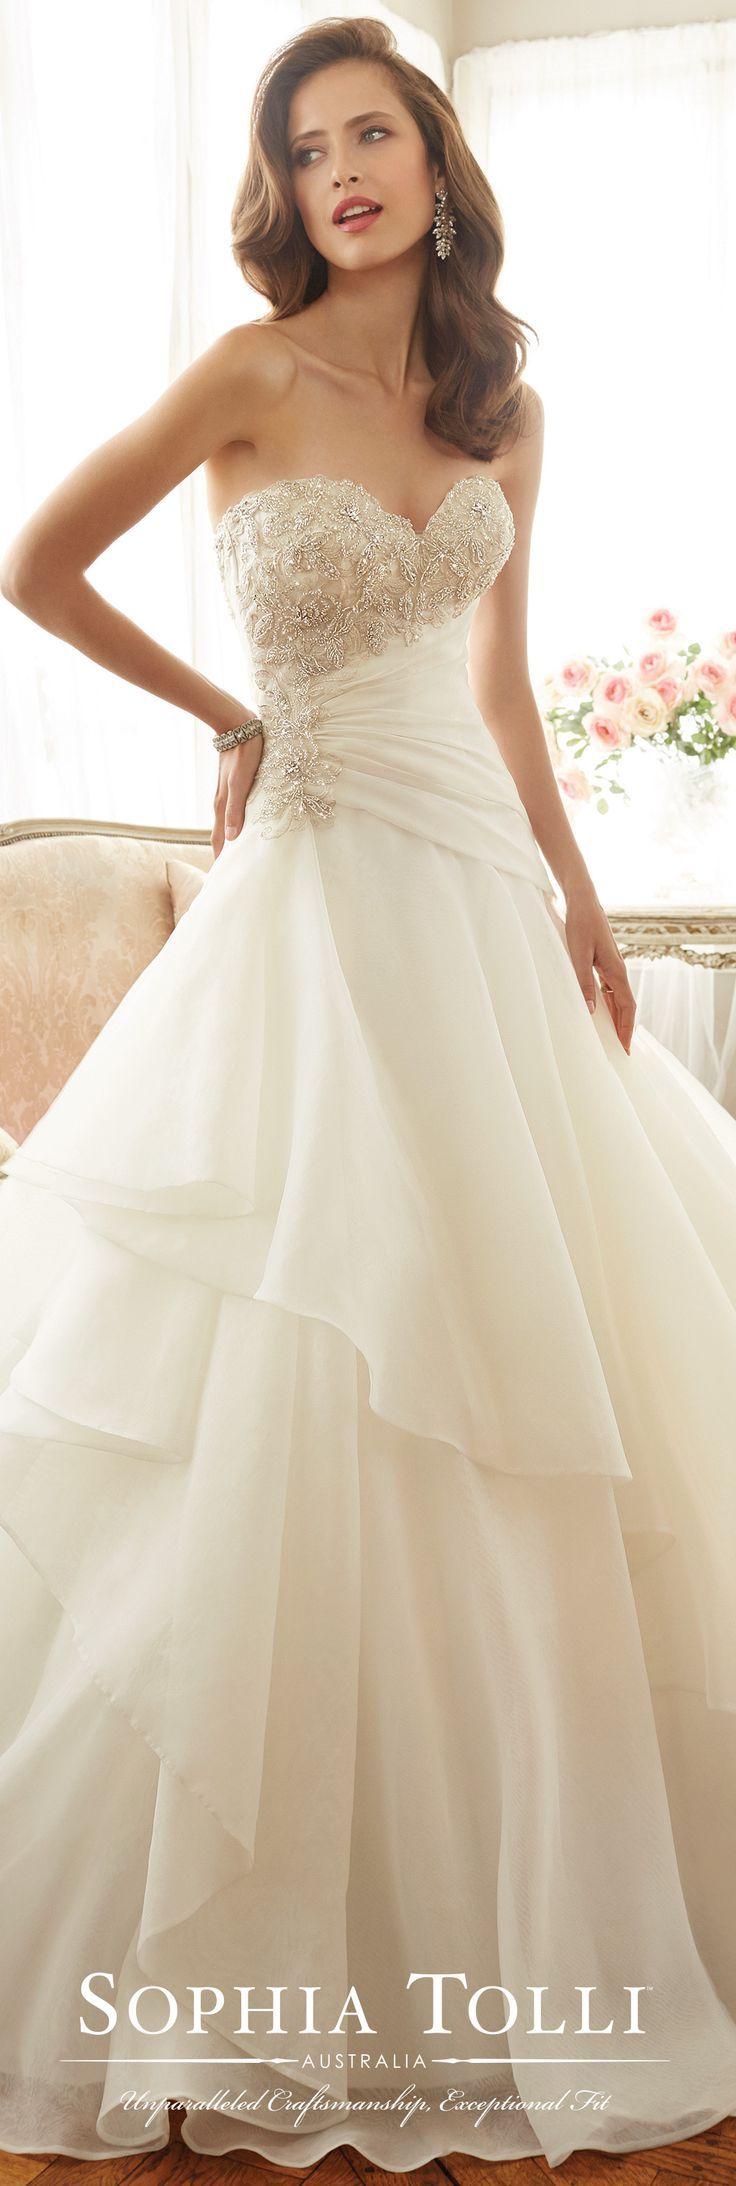 Wedding Dresses 2018 Vintage Dress 2017